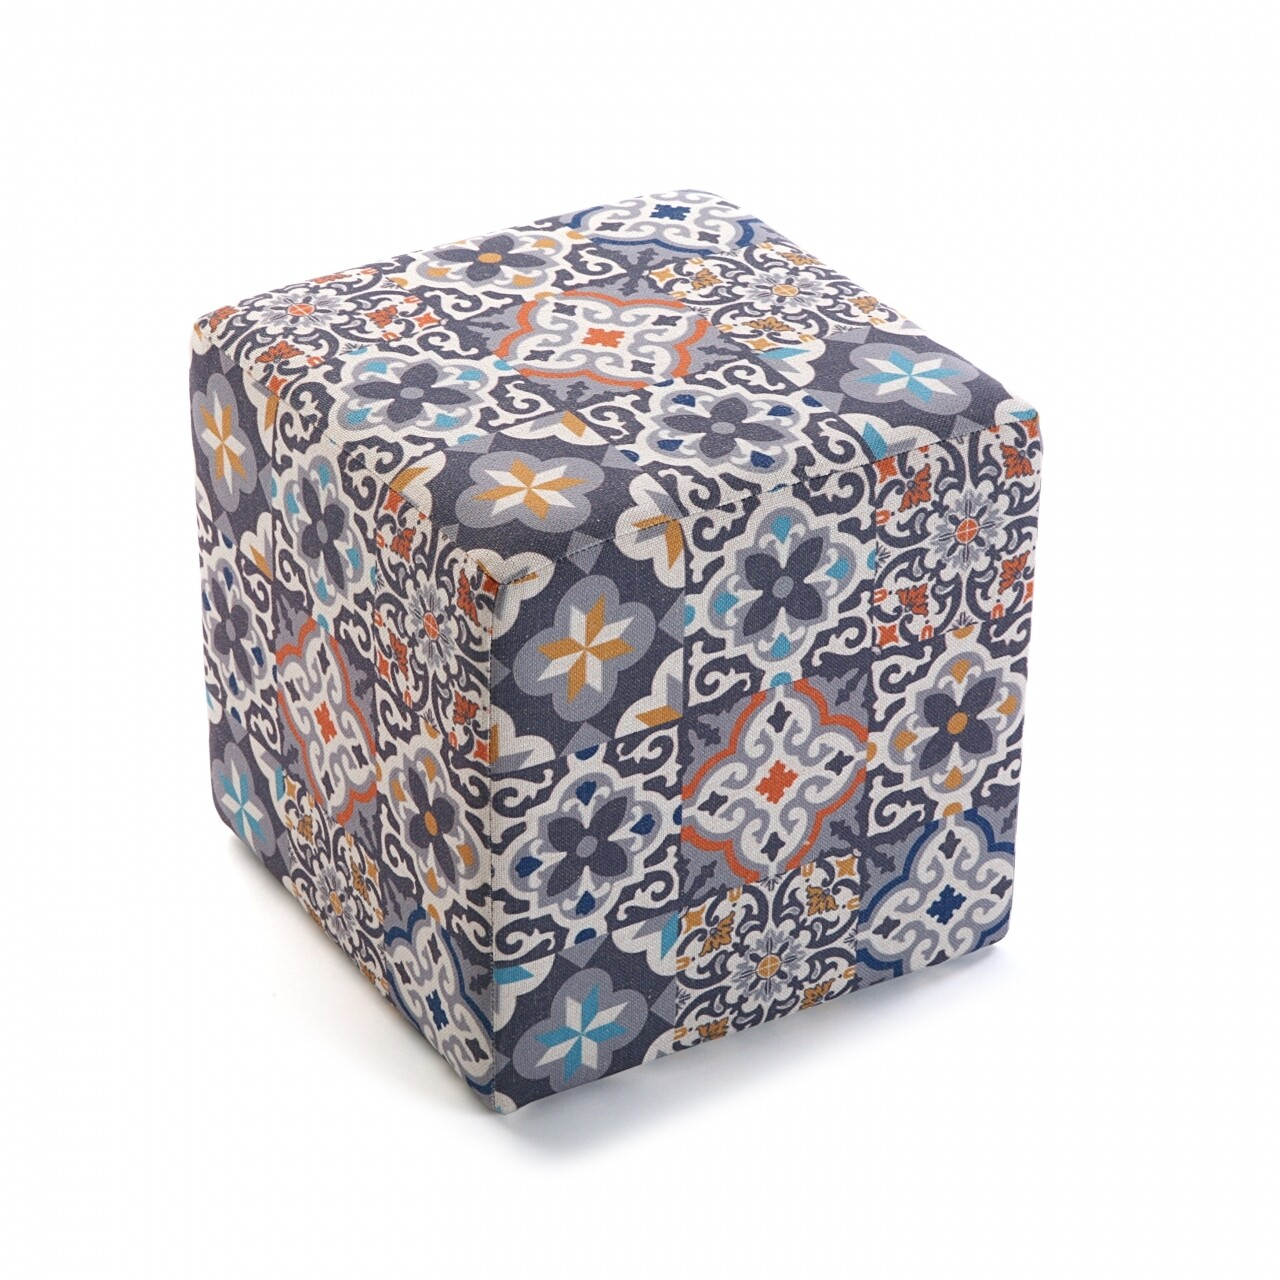 Taburet Alfama, 35 x 35 x 35 cm, poliester, multicolor